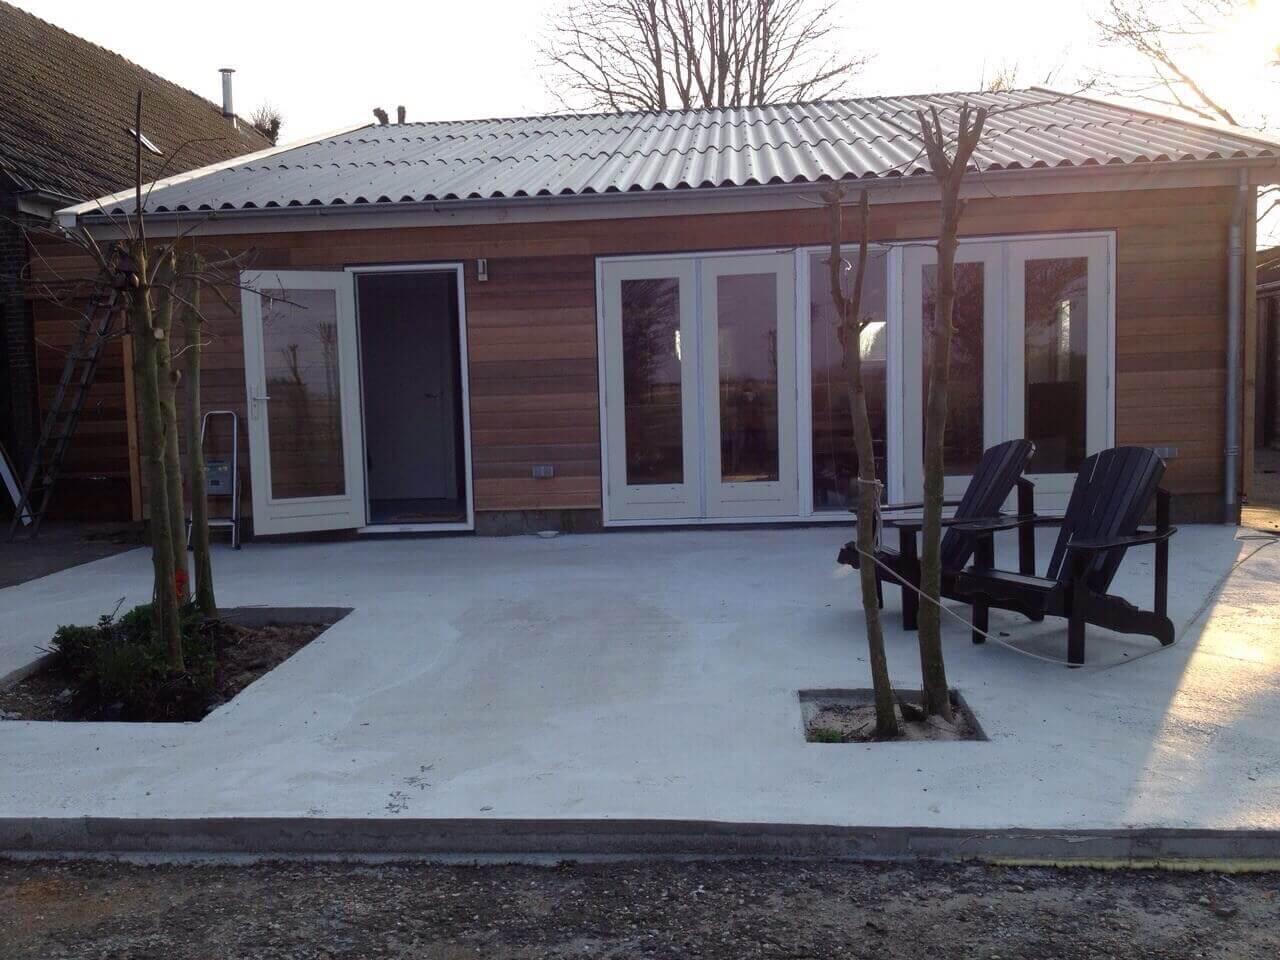 's-Gravelandseweg Weesp